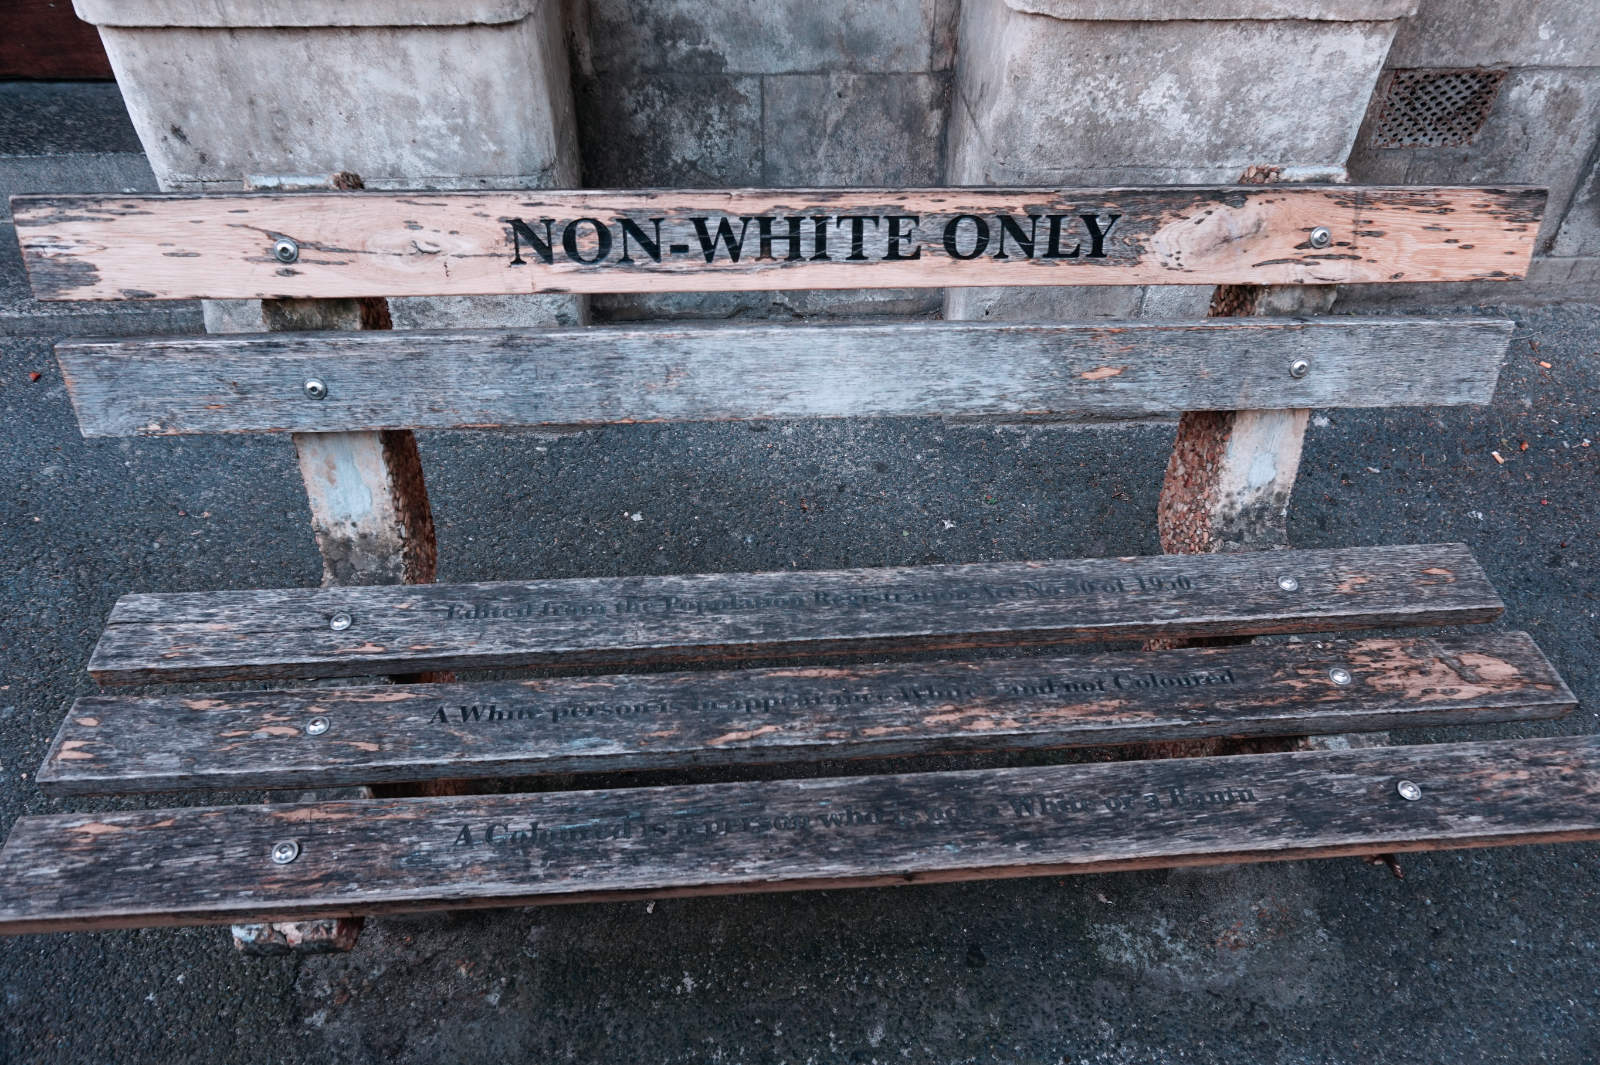 Mahnmal der Apartheid